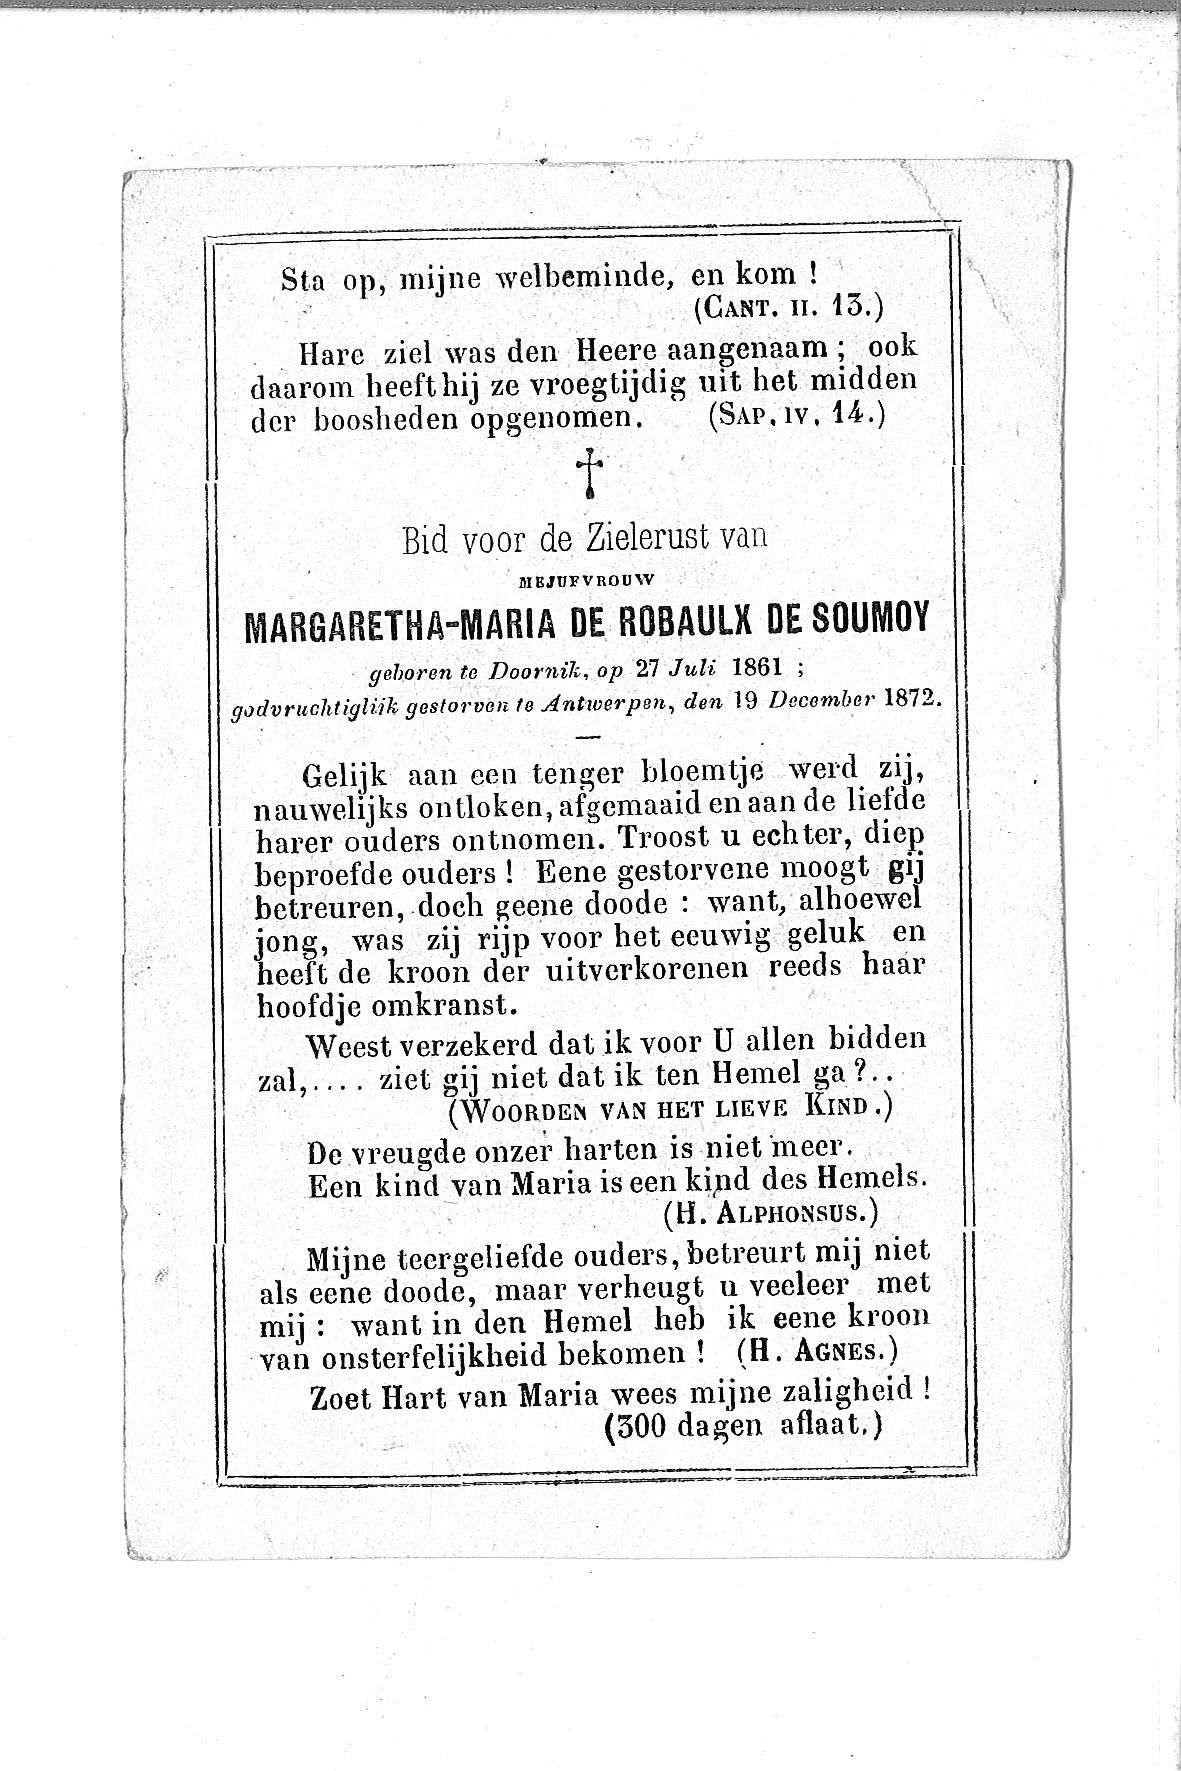 Margaretha-Maria-(1872)-20120814085427_00184.jpg